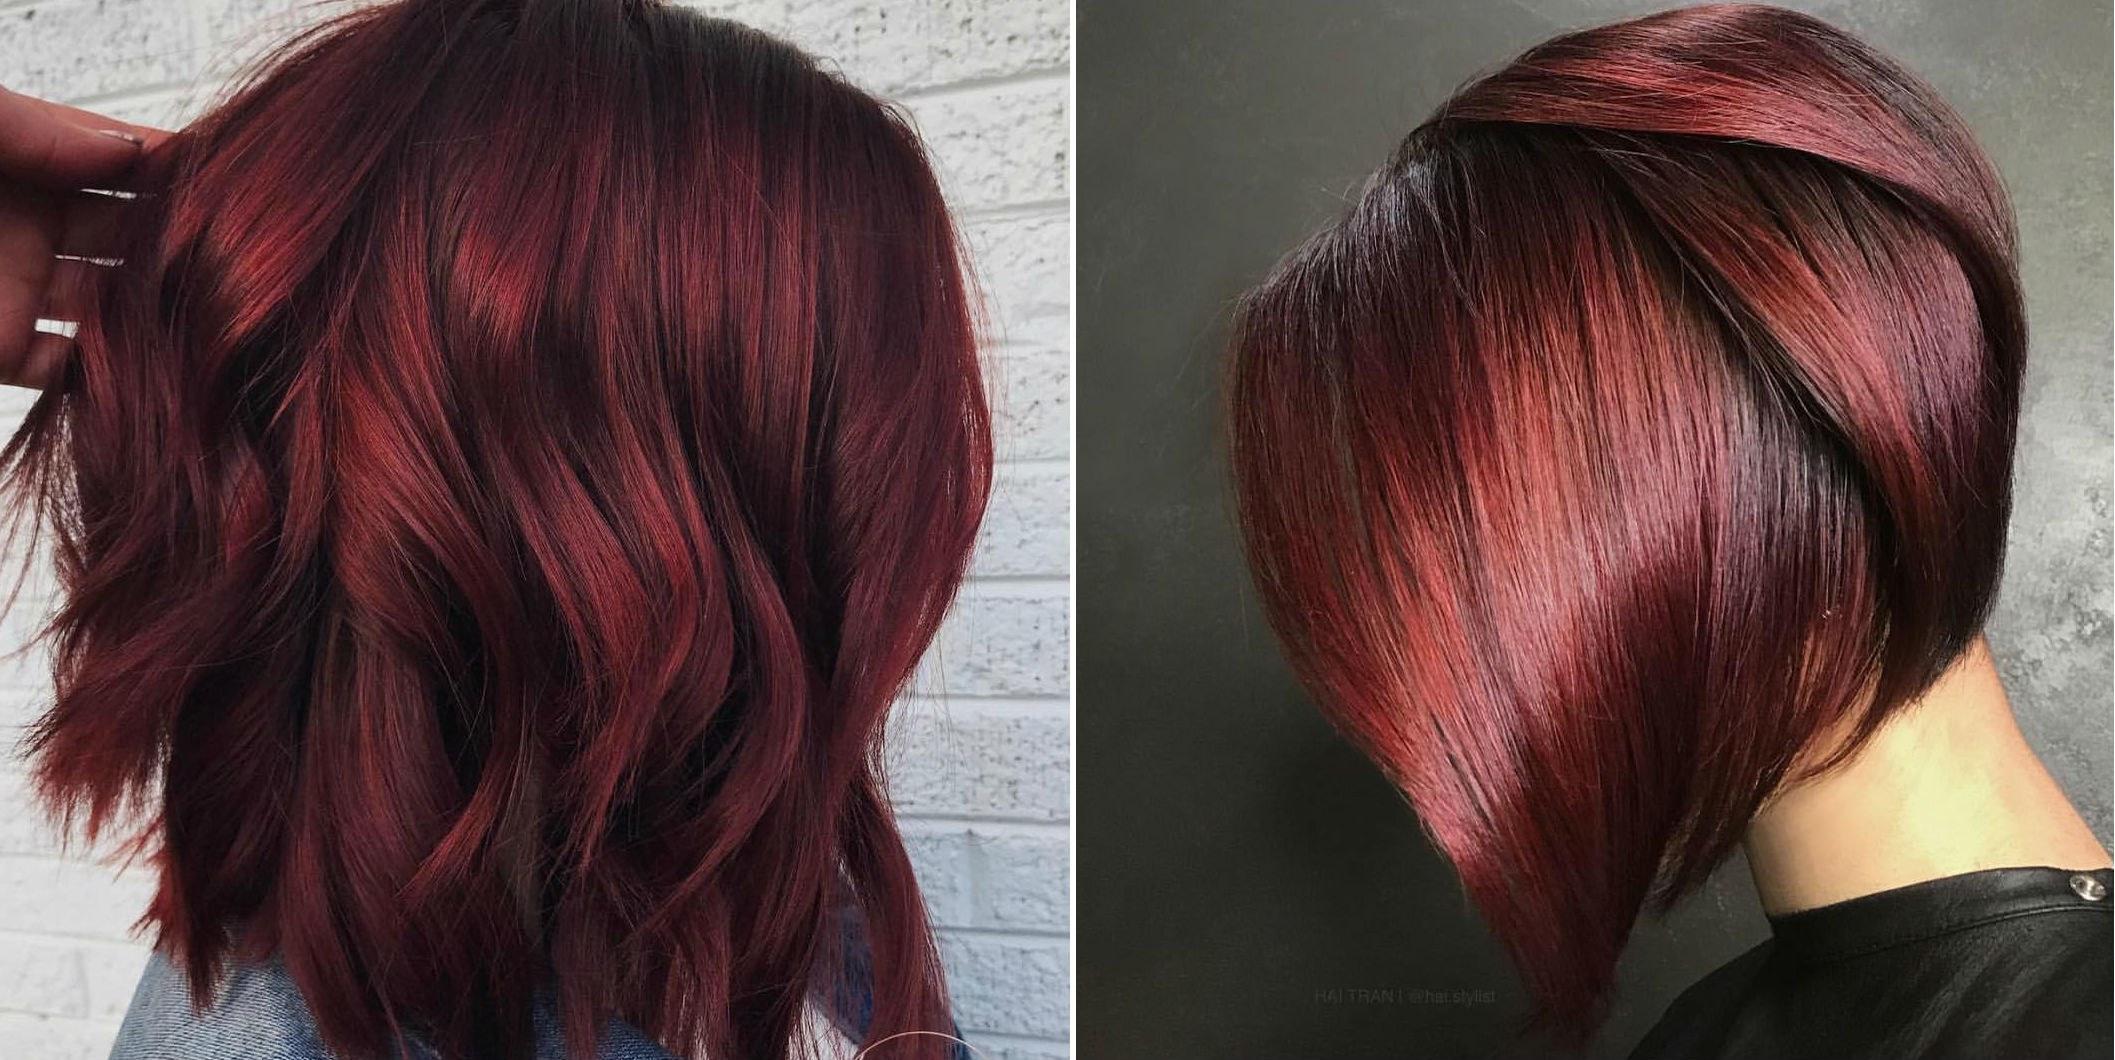 صبغ شعر أحمر توتي